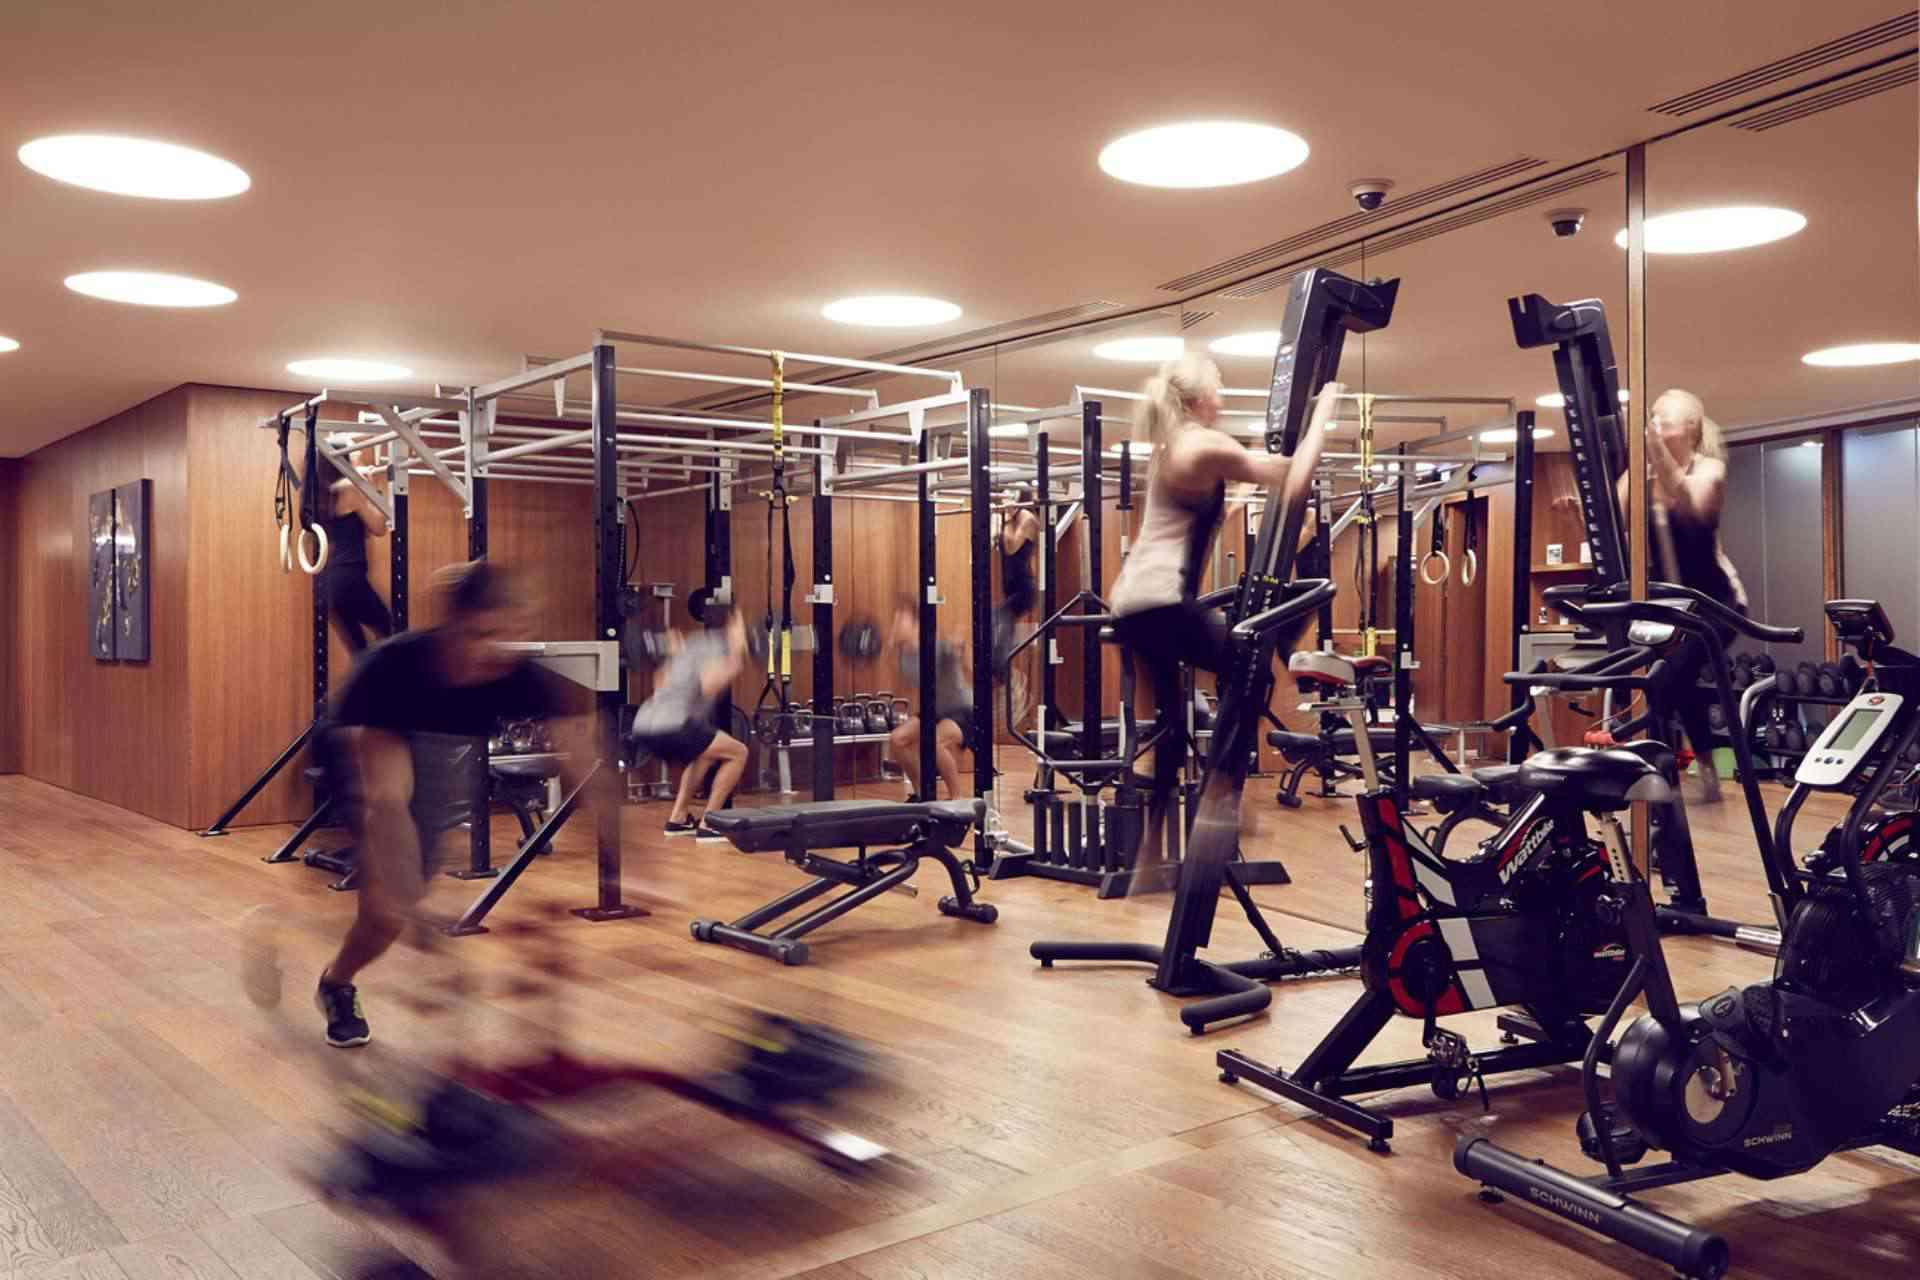 Bulgari Gym London